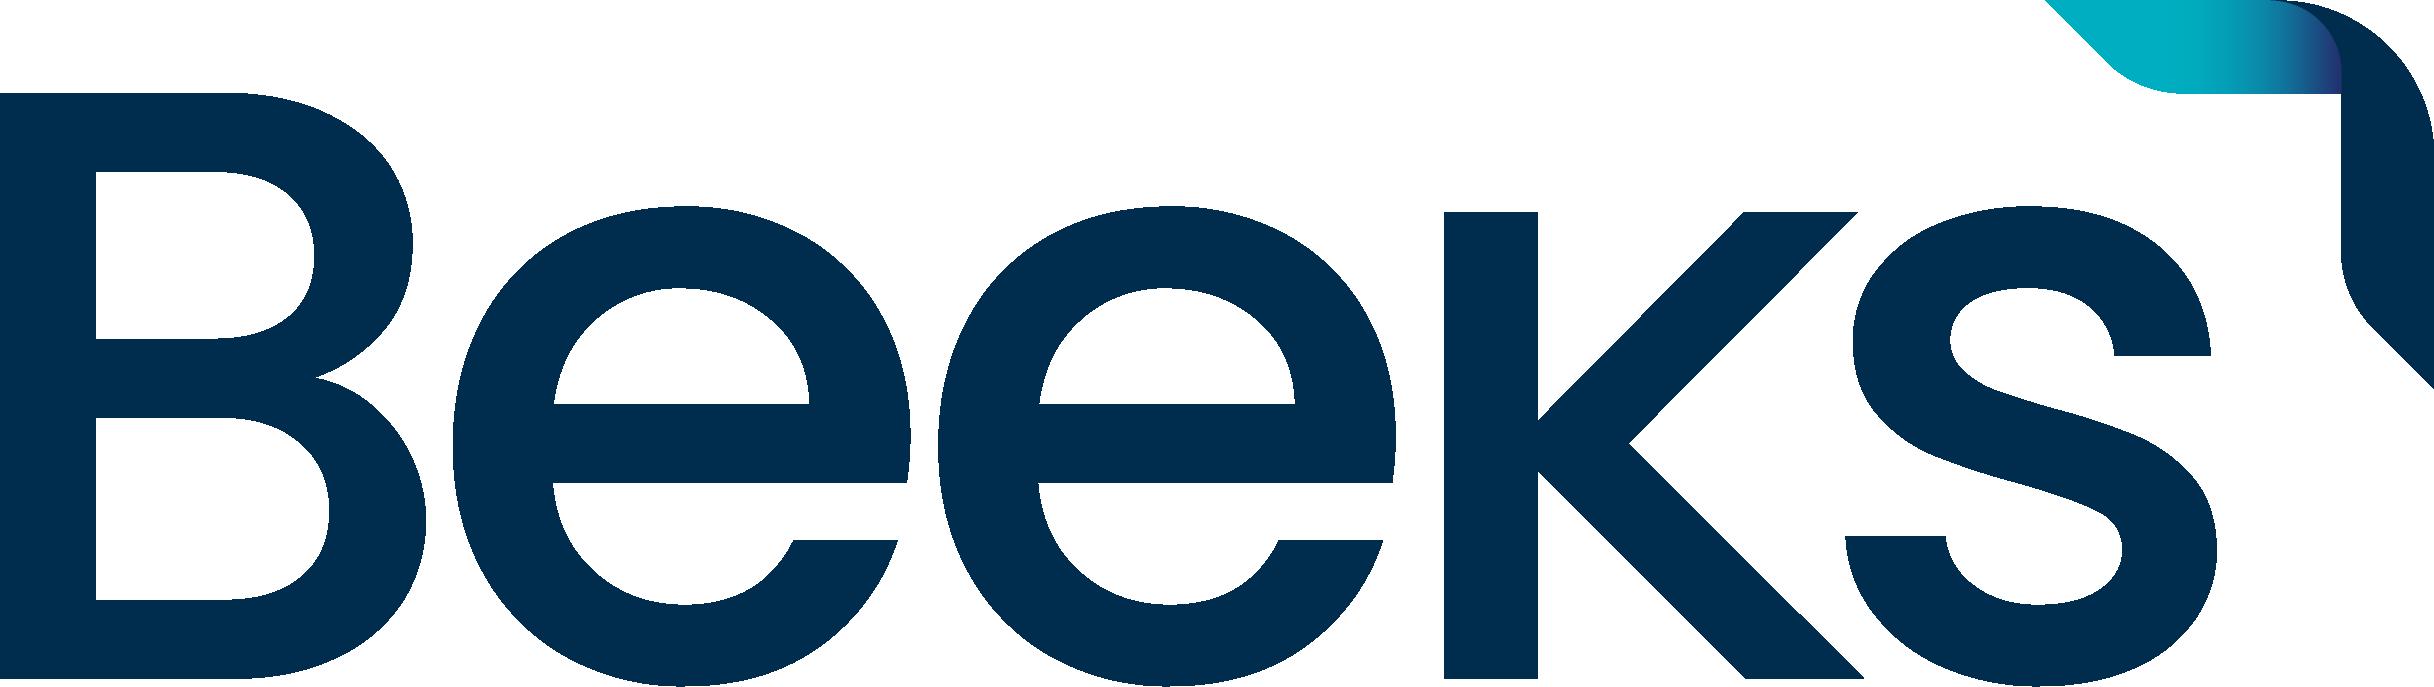 Beeks Group Logo